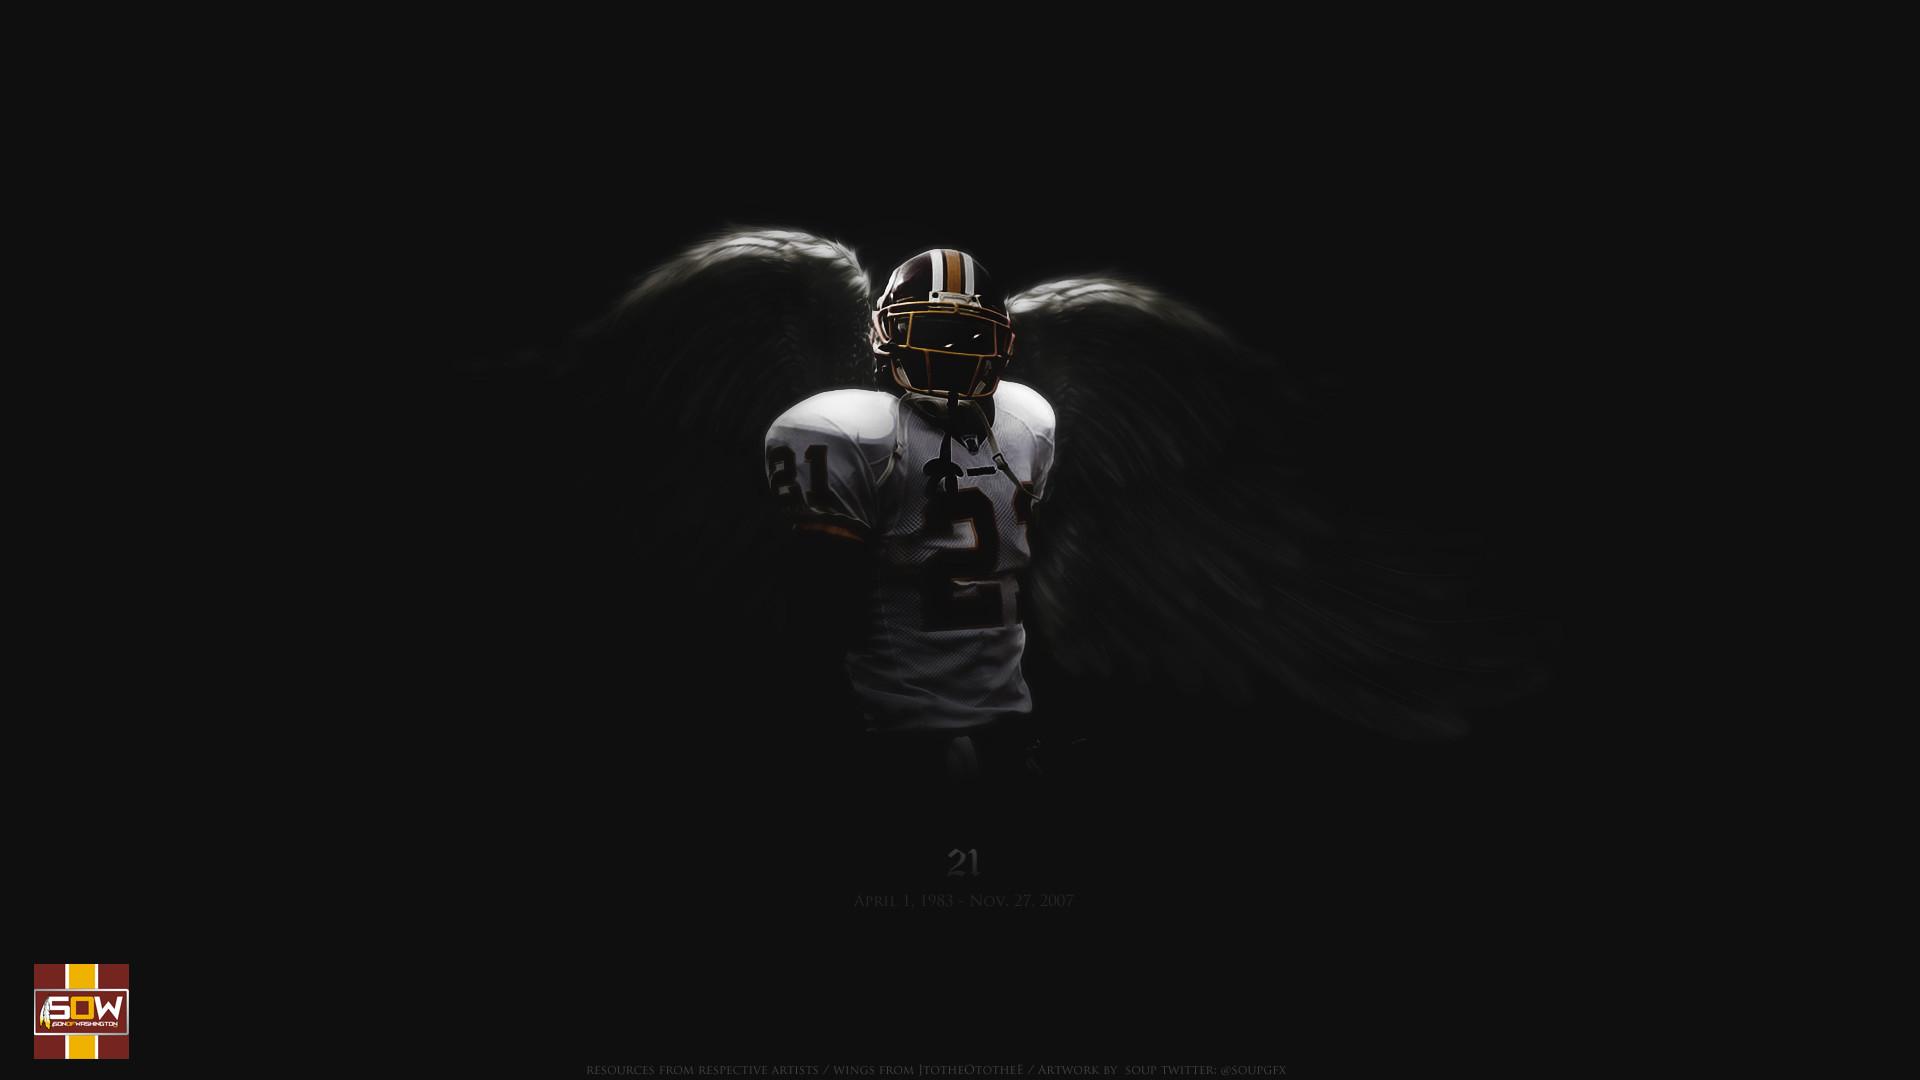 American Football Players wallpaper wallpaper free download 1500×917  American Football Wallpaper (55 Wallpapers) | Adorable Wallpapers |  Wallpaper …